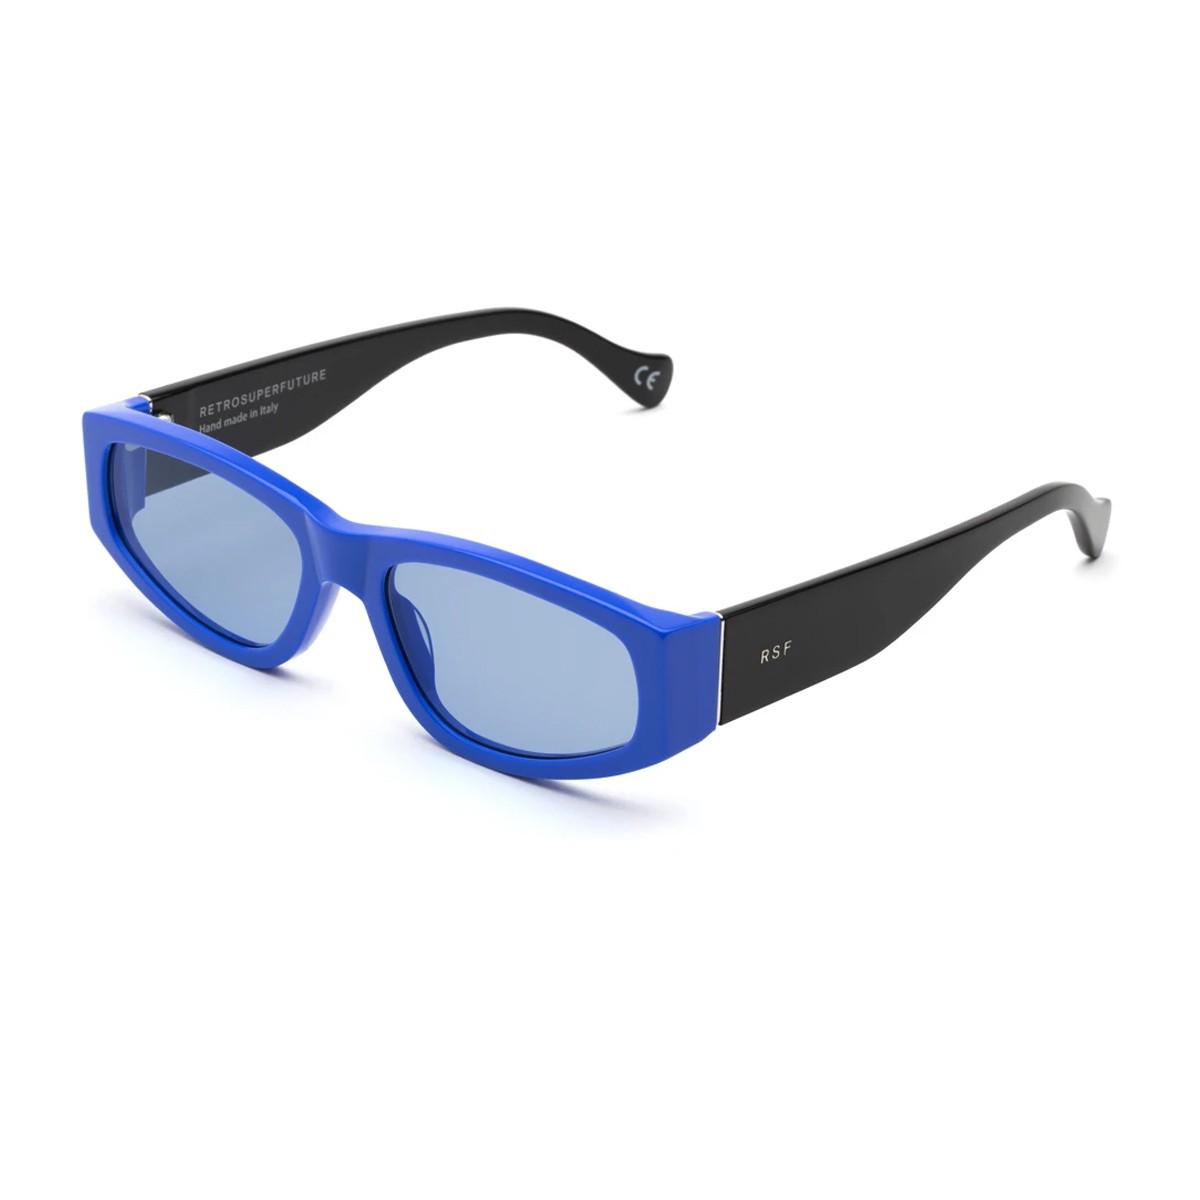 Super Neema   Unisex sunglasses